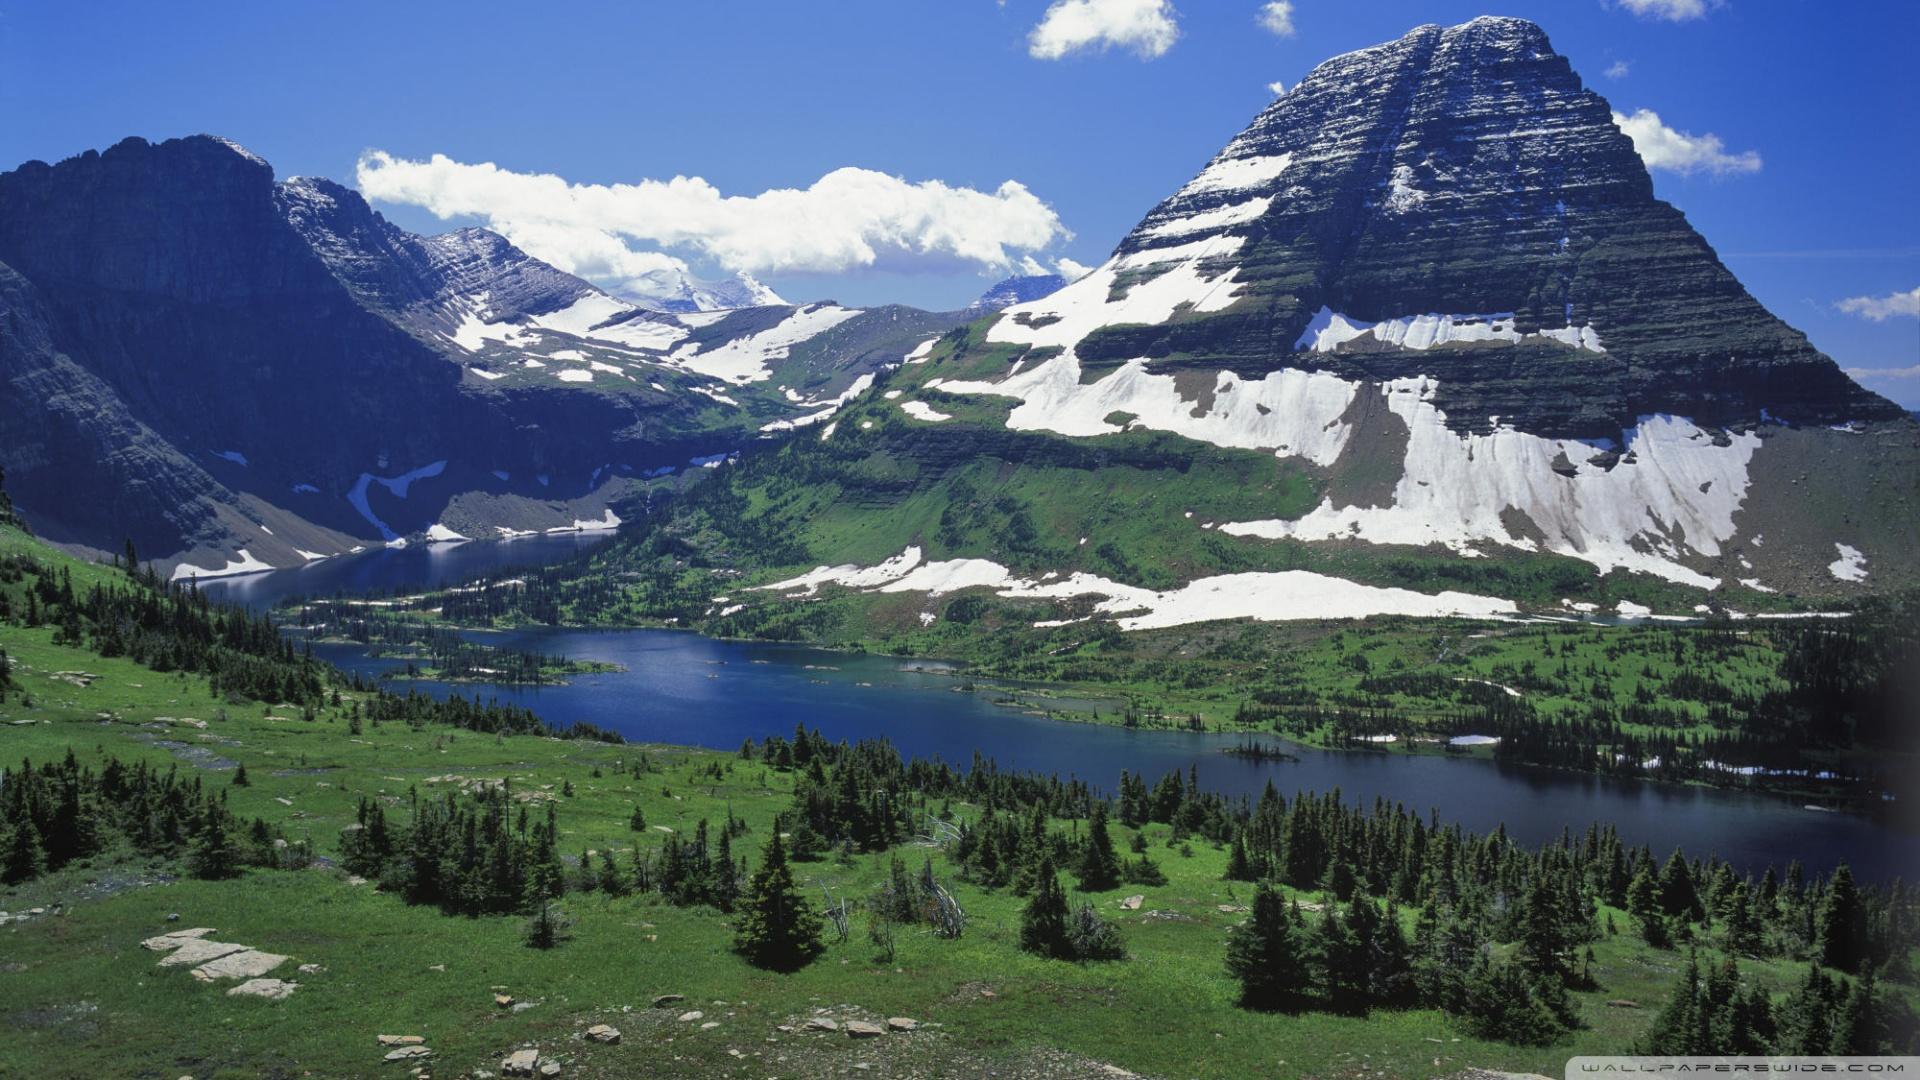 Download Hidden Lake Glacier National Park Montana Wallpaper 1920x1080 1920x1080